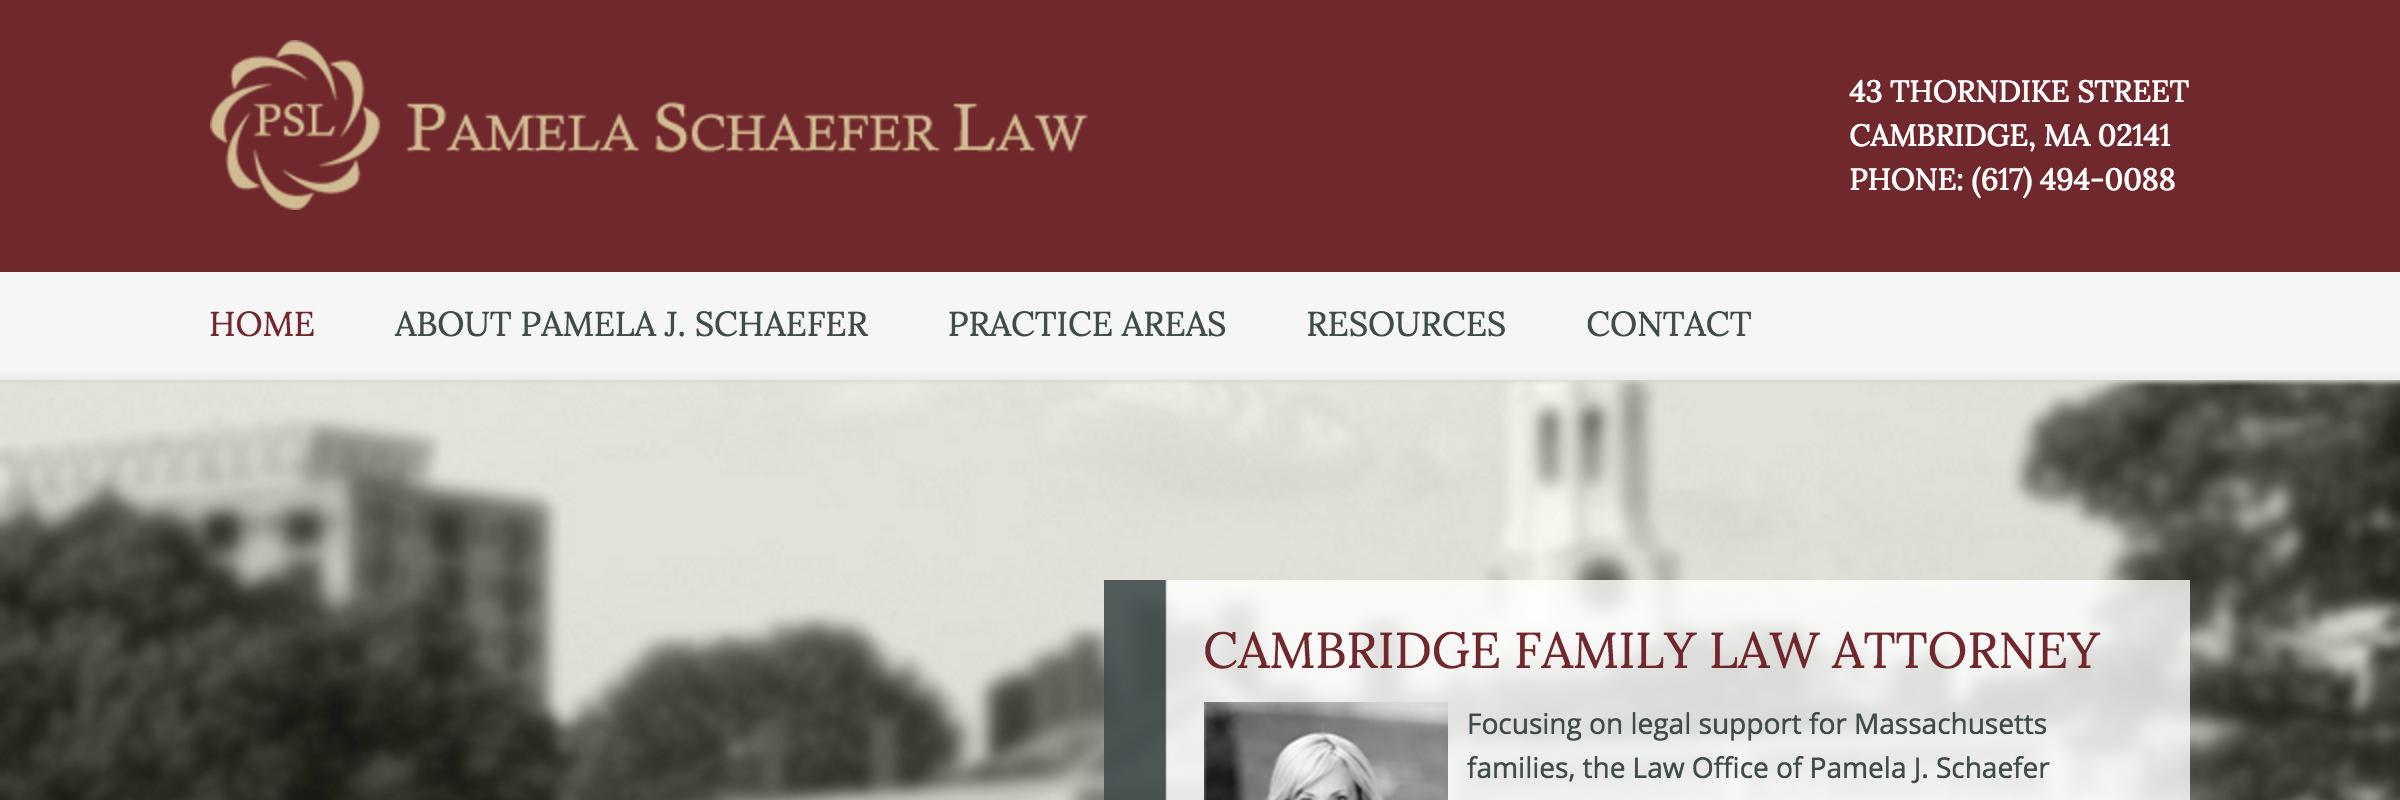 Pamela Schaefer Law